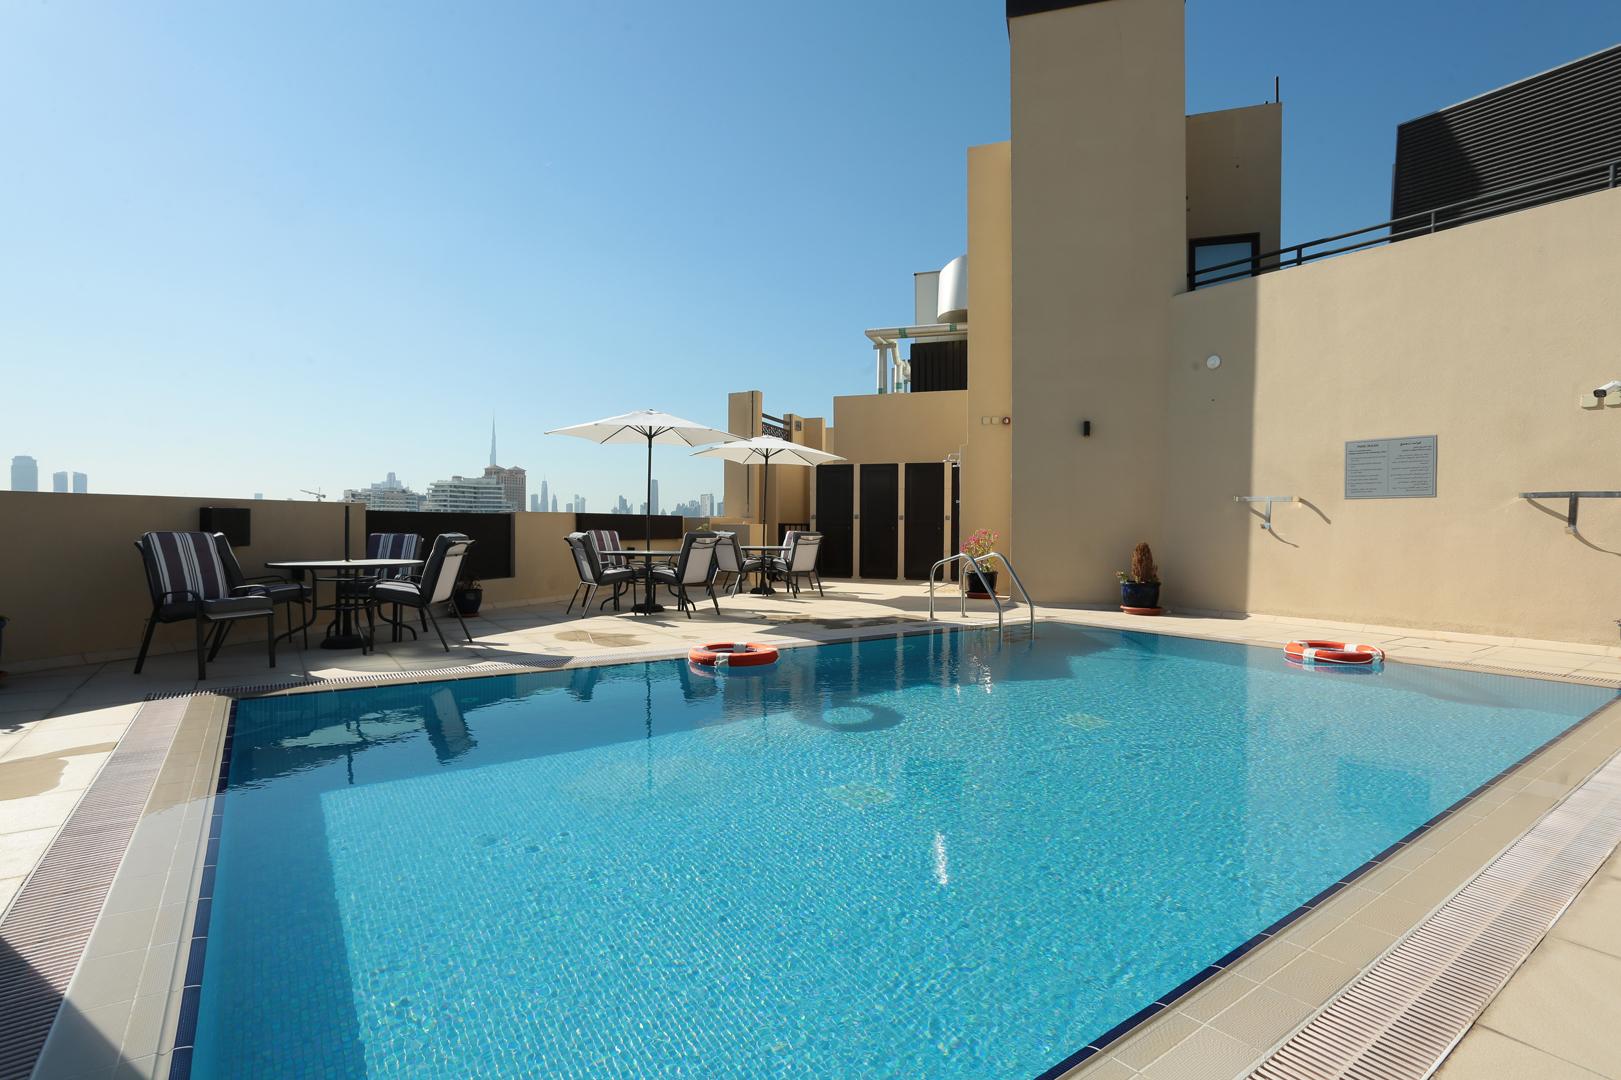 Apartment Marbella Luxury 2 bedrooms photo 27263091